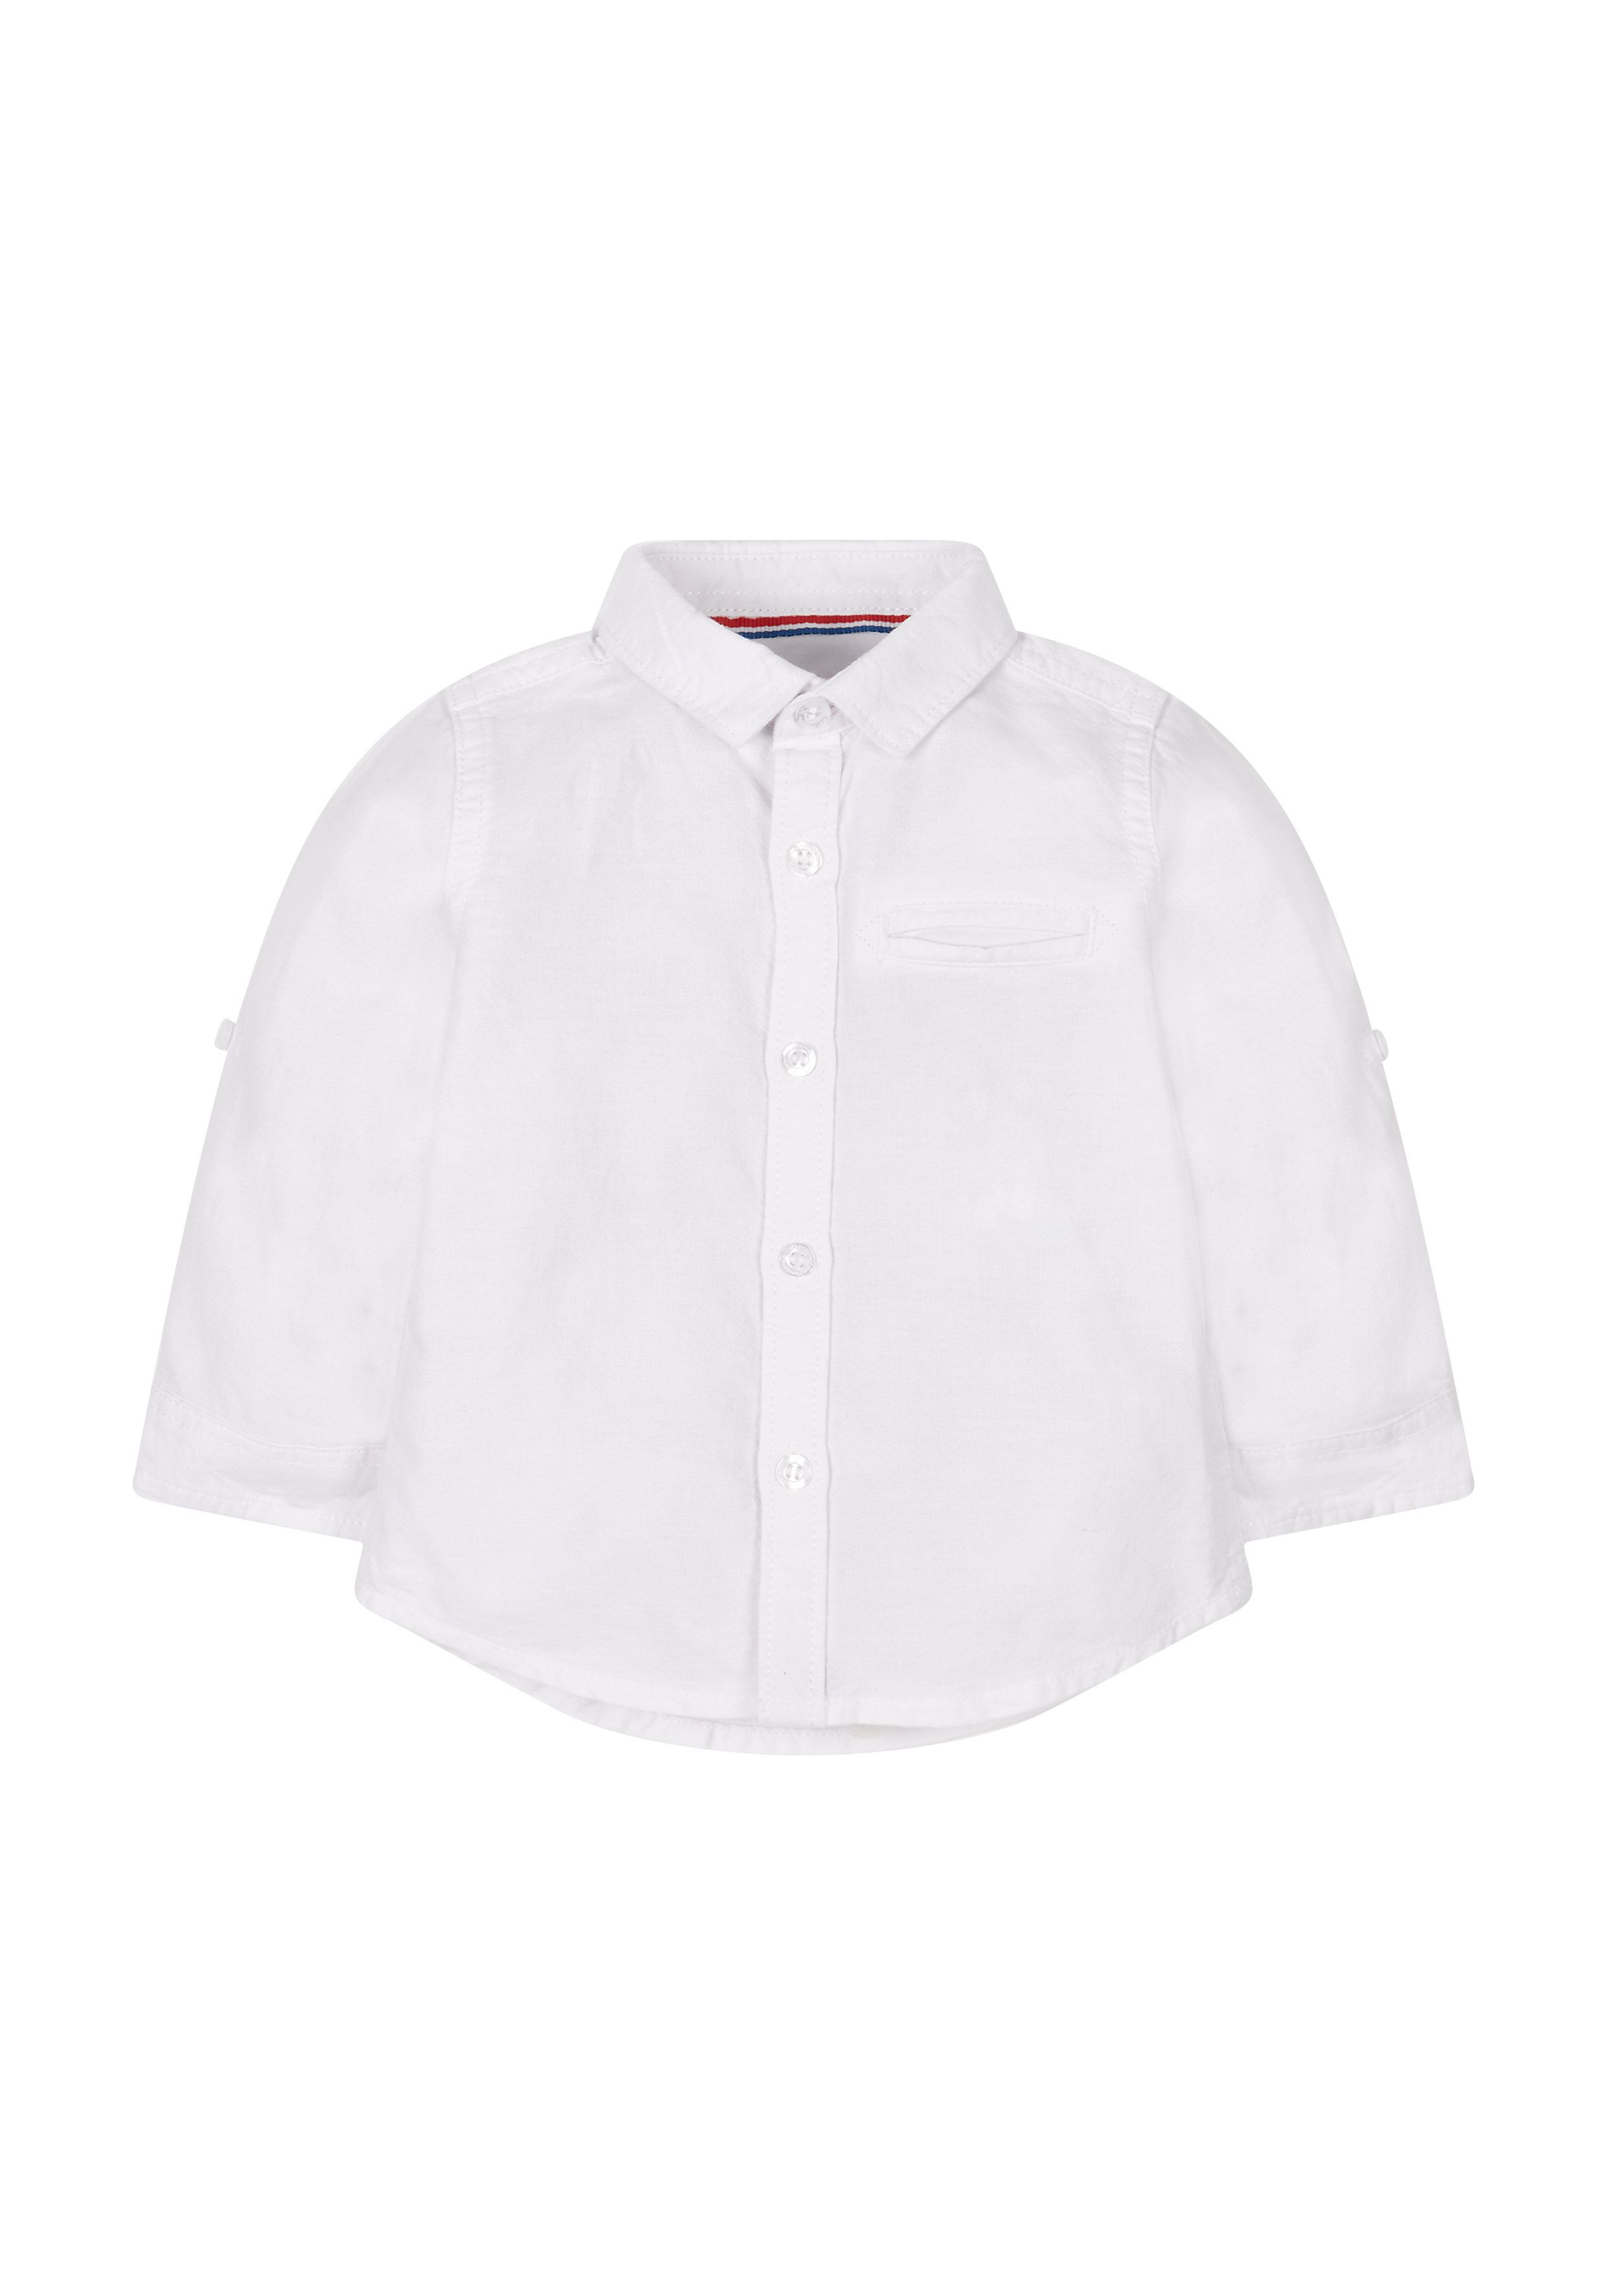 Mothercare | White Oxford Shirt